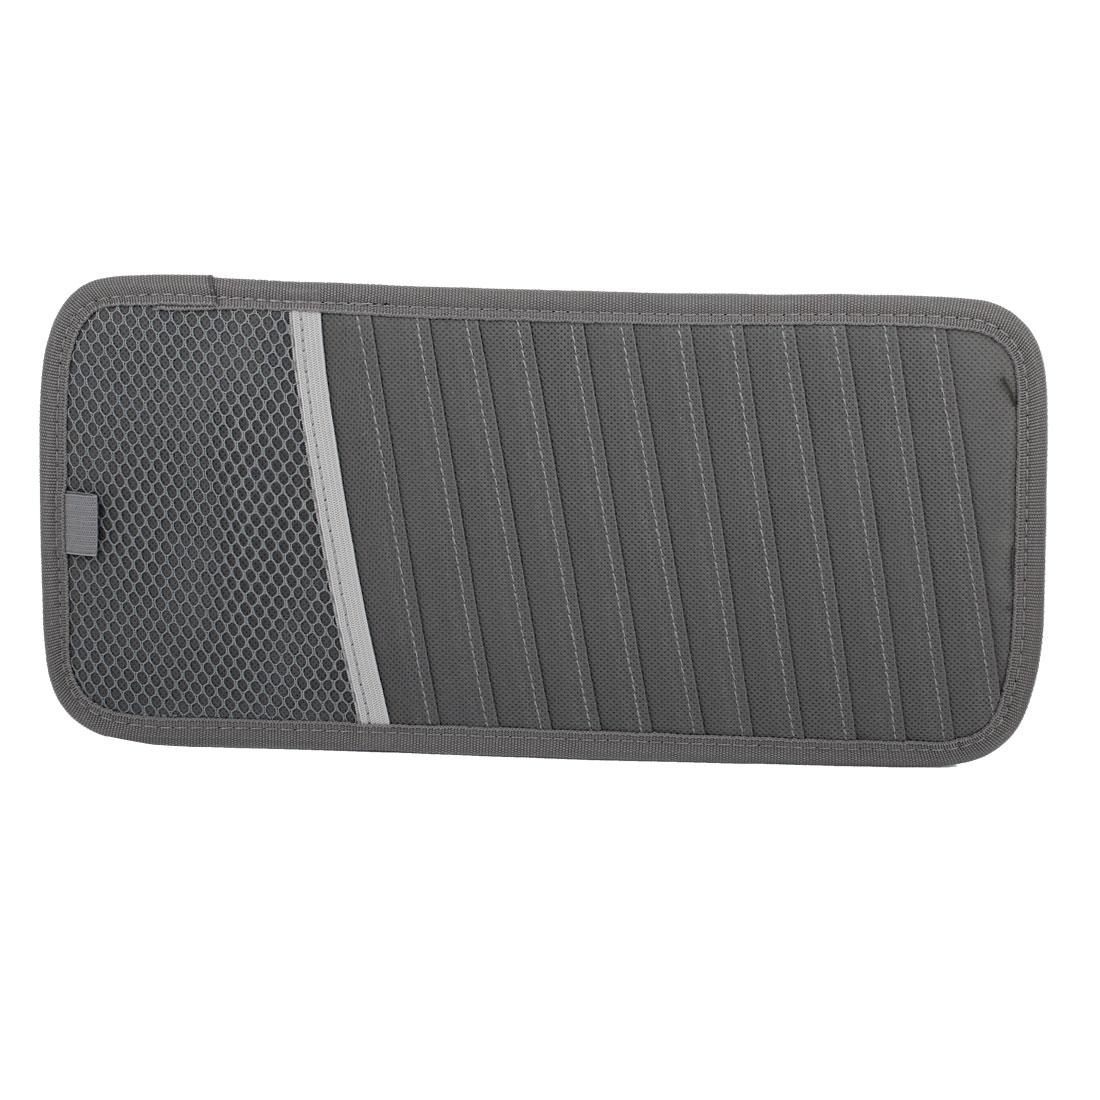 31cm x 15cm Vehicles Gray Sun Visor CD DVD Holder Case 12 Compartments